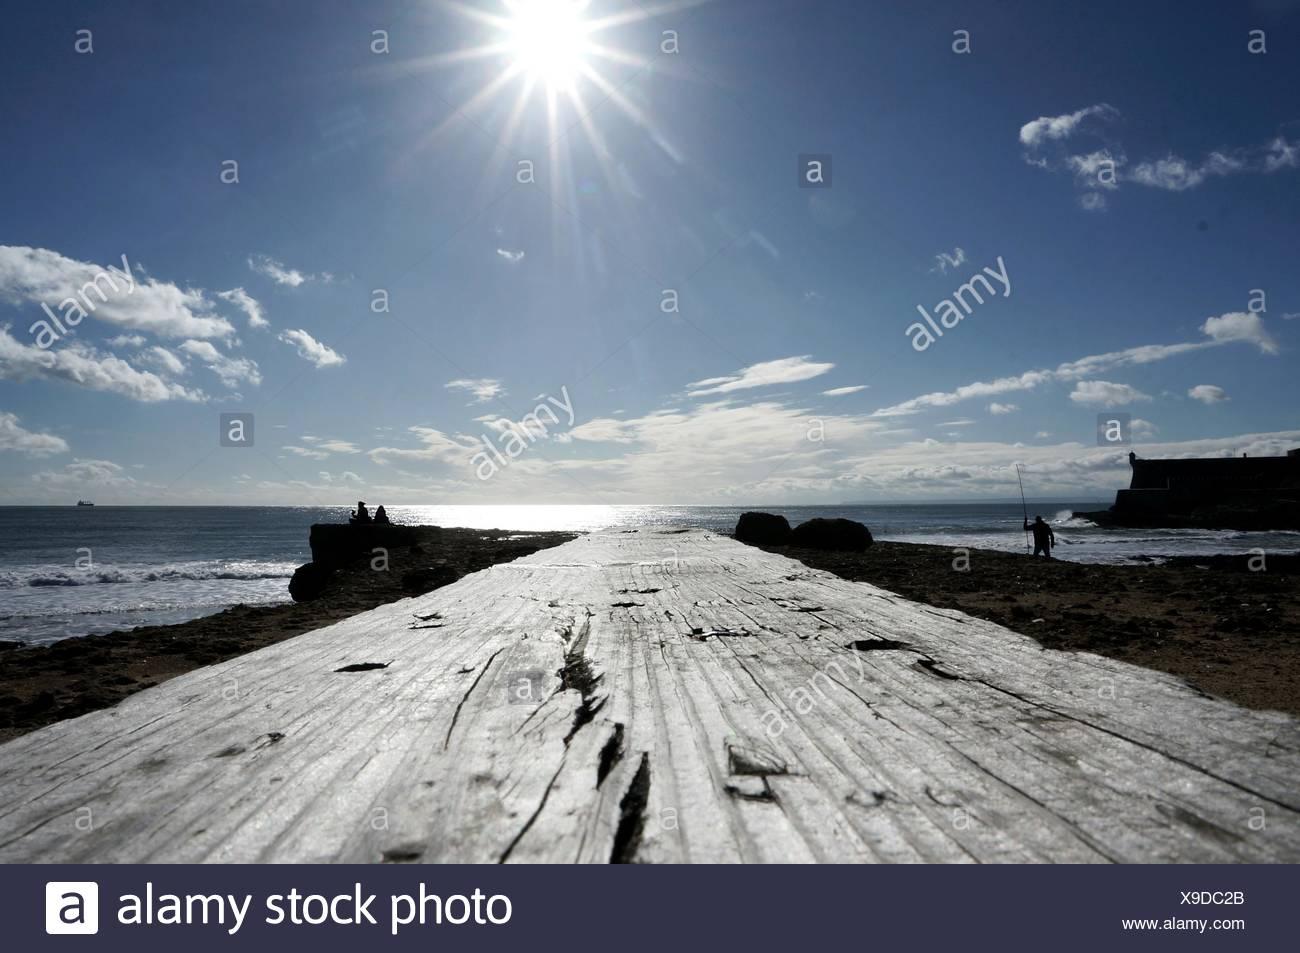 Boardwalk Leading Towards Lake Against Sky On Sunny Day Stock Photo